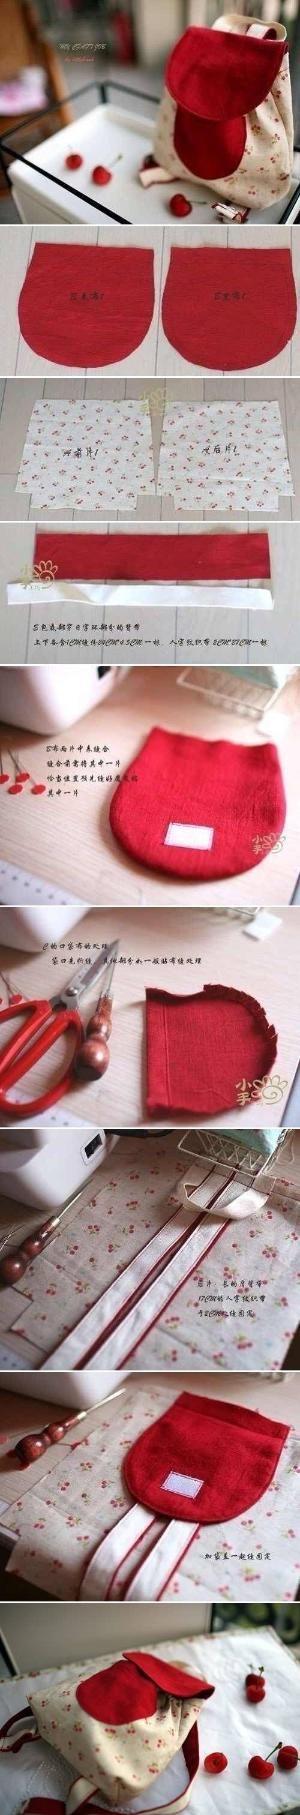 DIY Cute Little Backpack by Nina Maltese